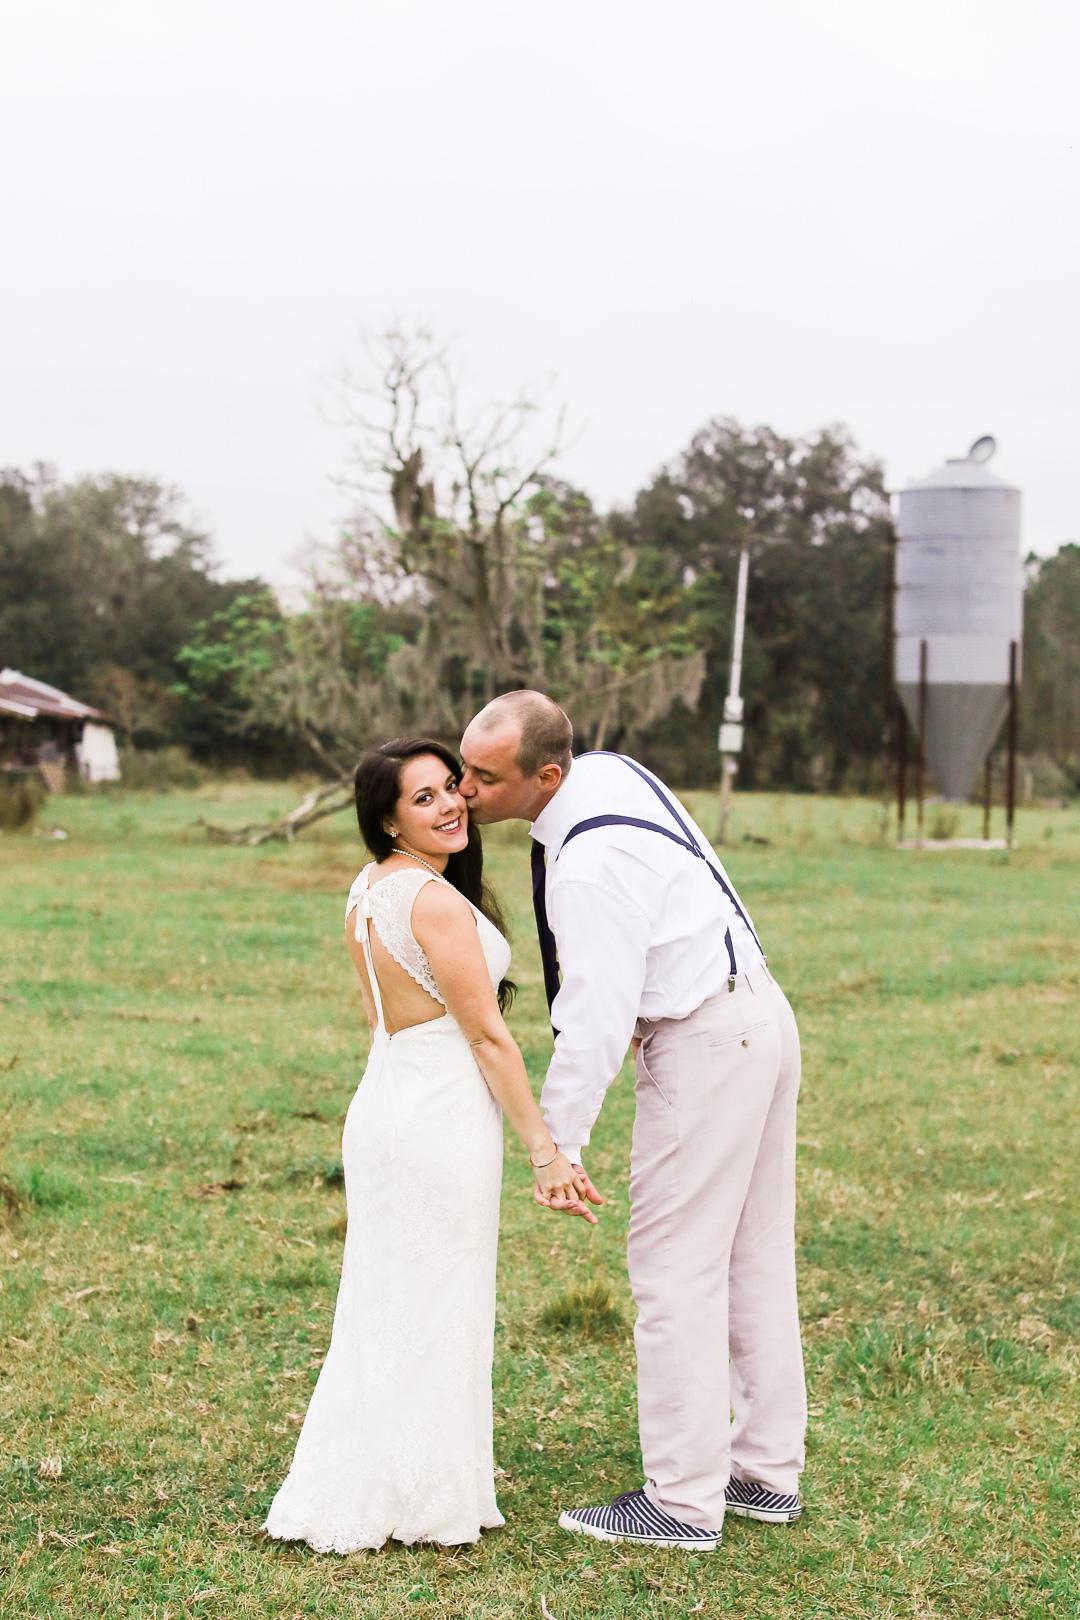 williams_family_newlywed-185.jpg